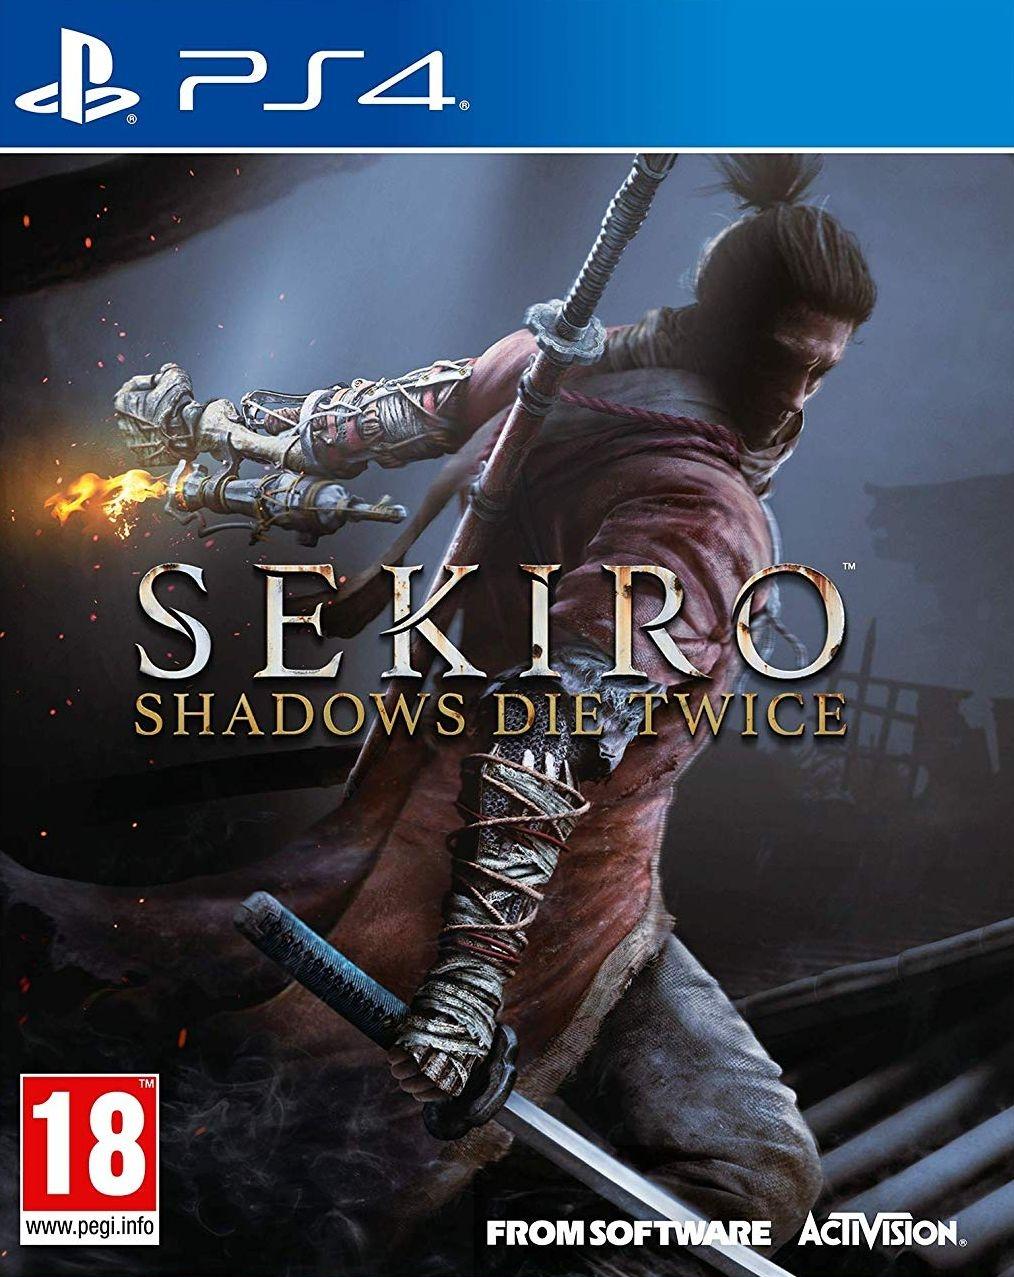 PS4 Sekiro Shadows Die Twice